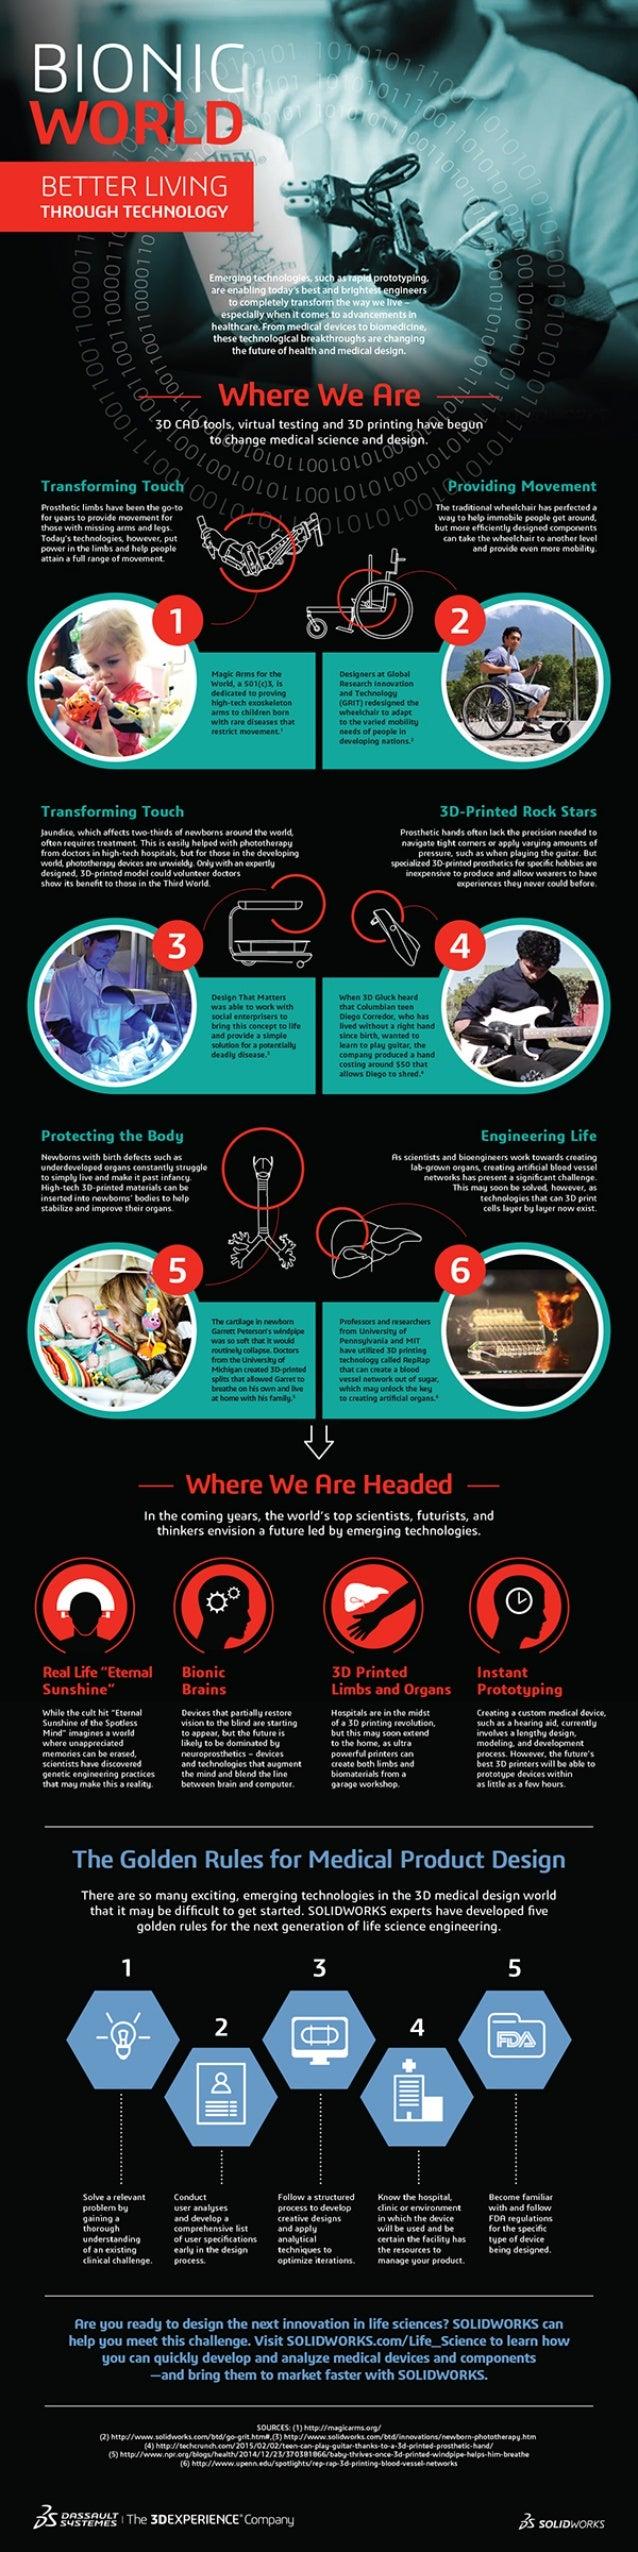 Dassault Systemes Bionic World